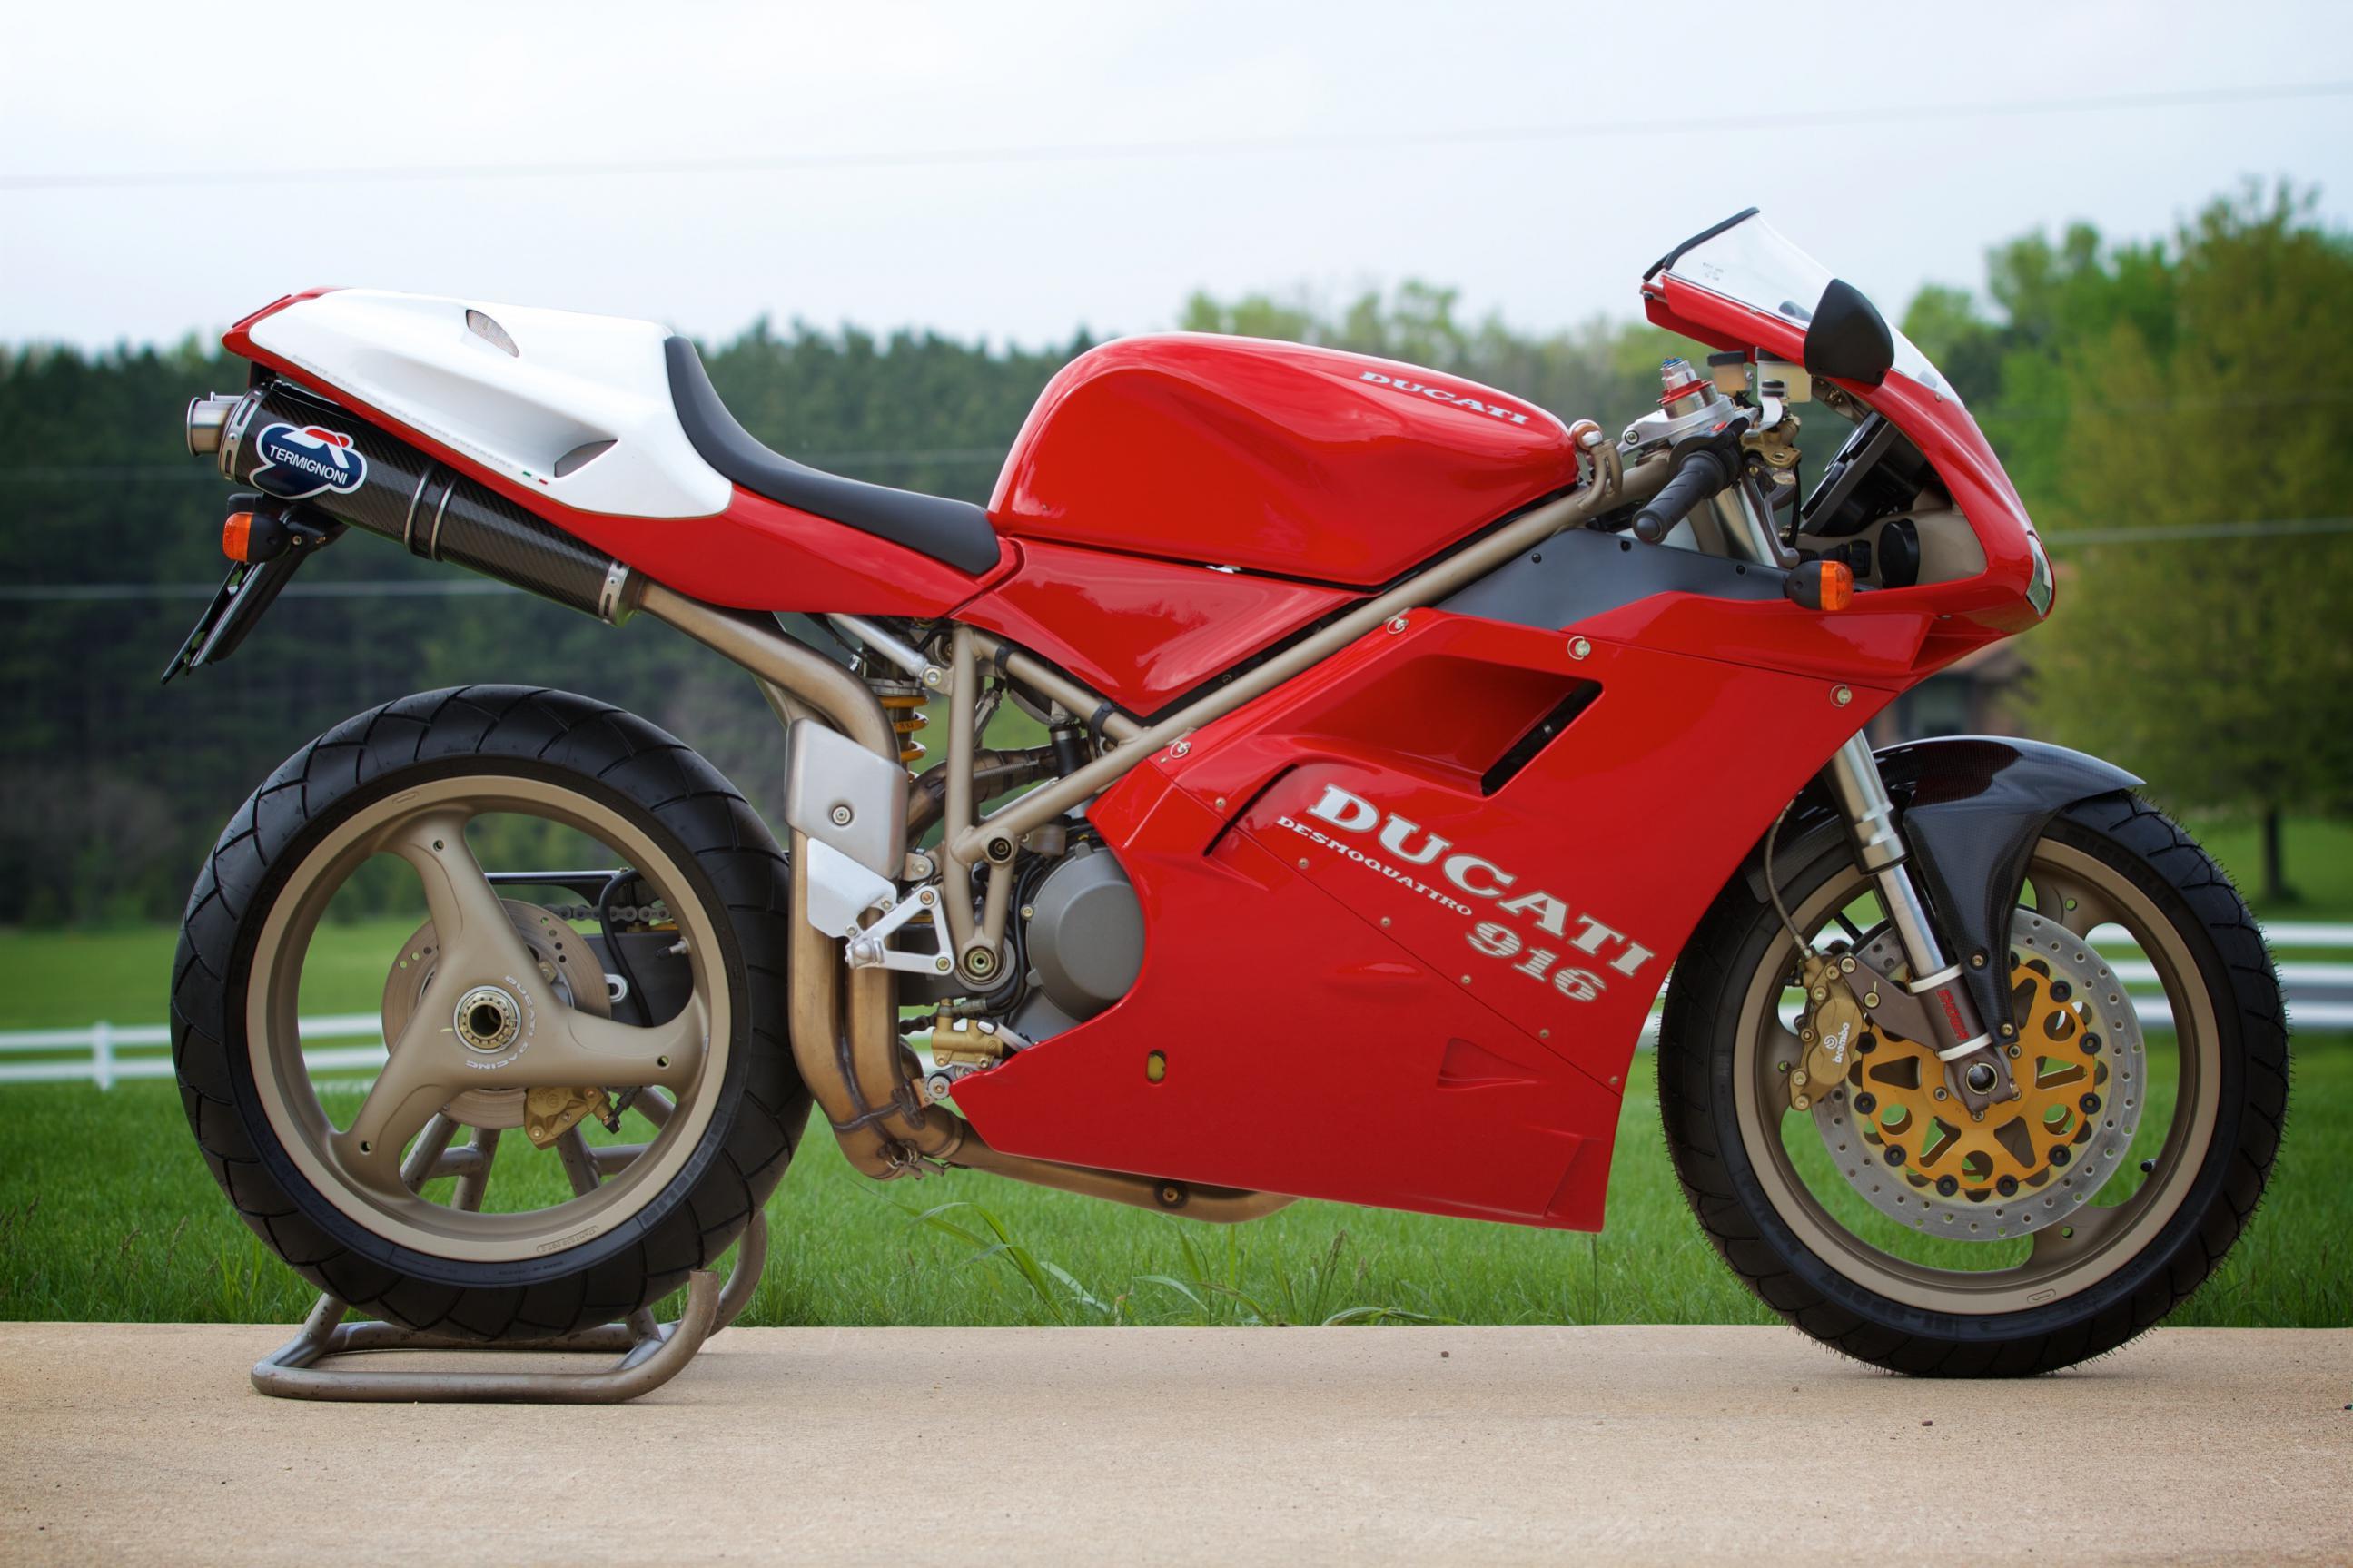 Ducati 916 SPA (955 SP)